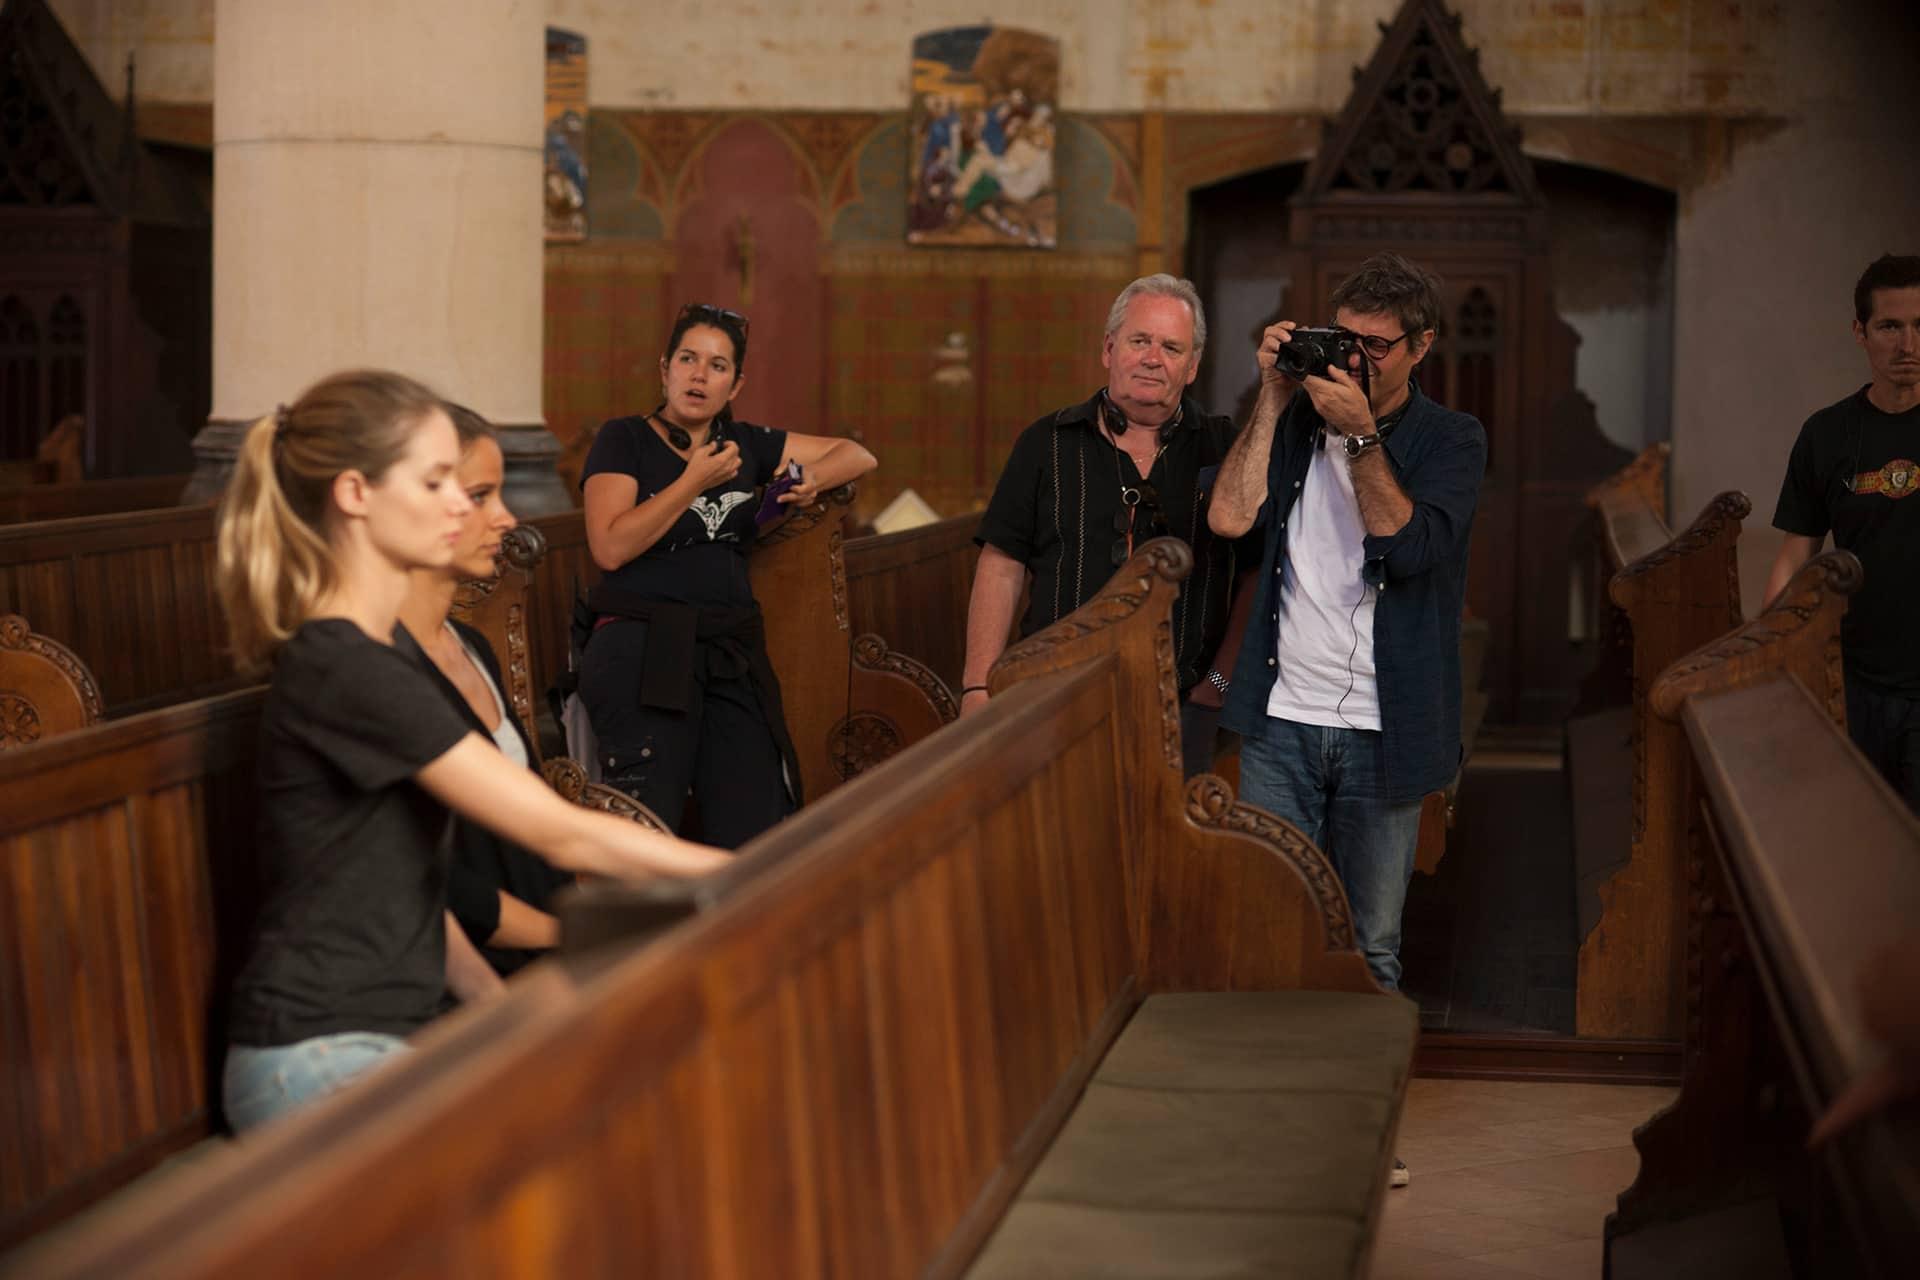 (L to R) 3rd AD Emese Matuz, Producer John Calvert, Director Paolo Barzman with Stand-ins Izabella Szabadkai and Patricia Hegedüs on the set of X Company Season 3.